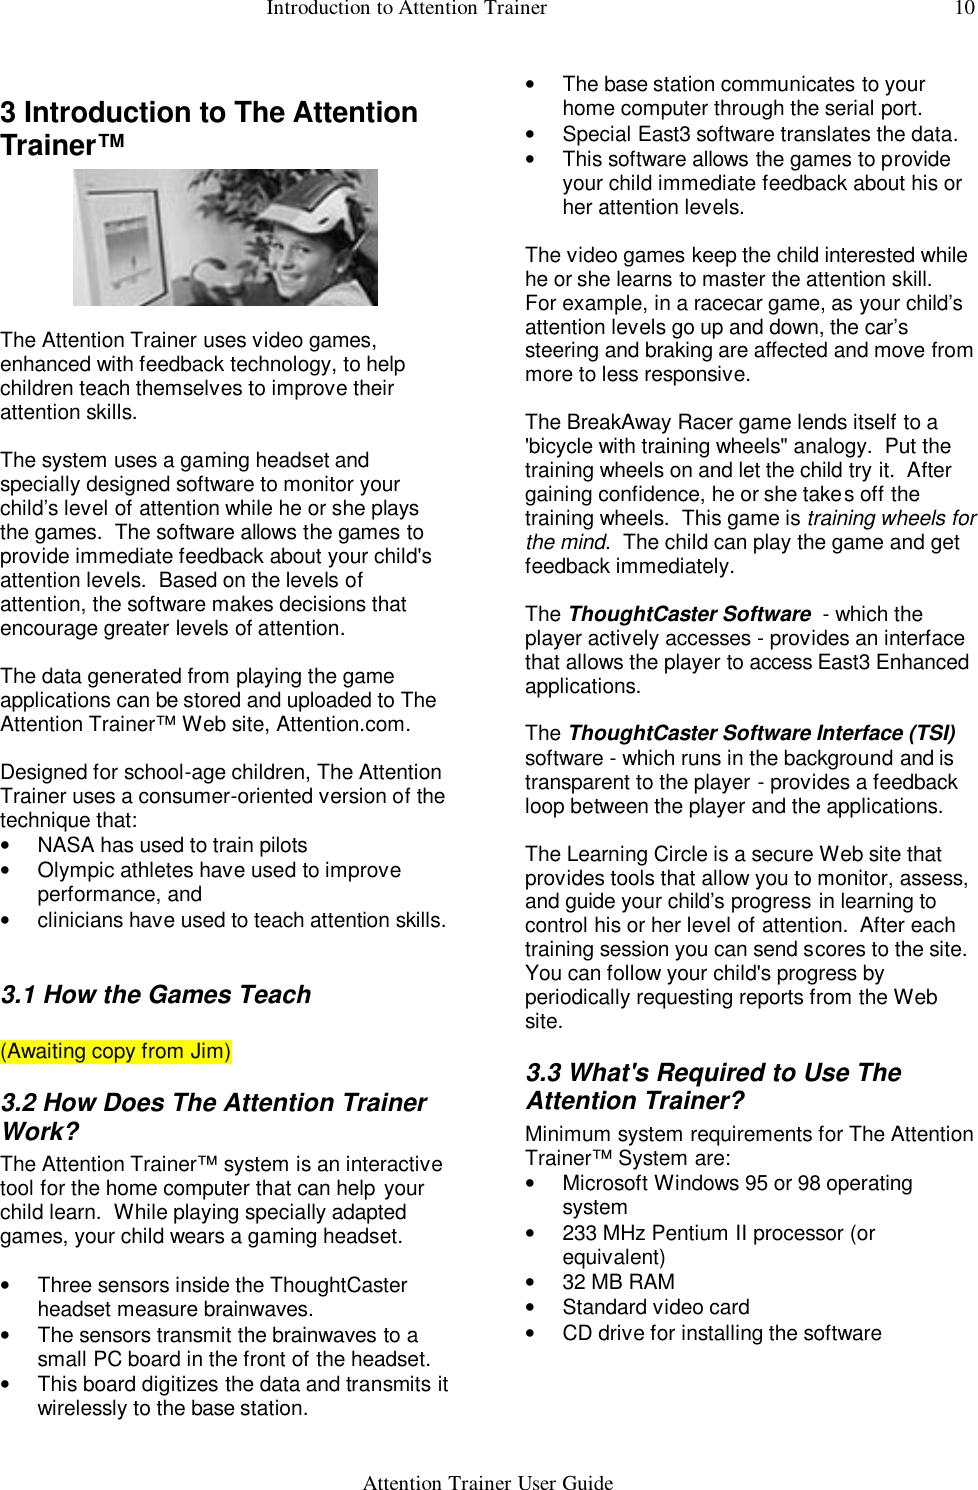 Patapsco Designs TC2000-H Headset User Manual manual